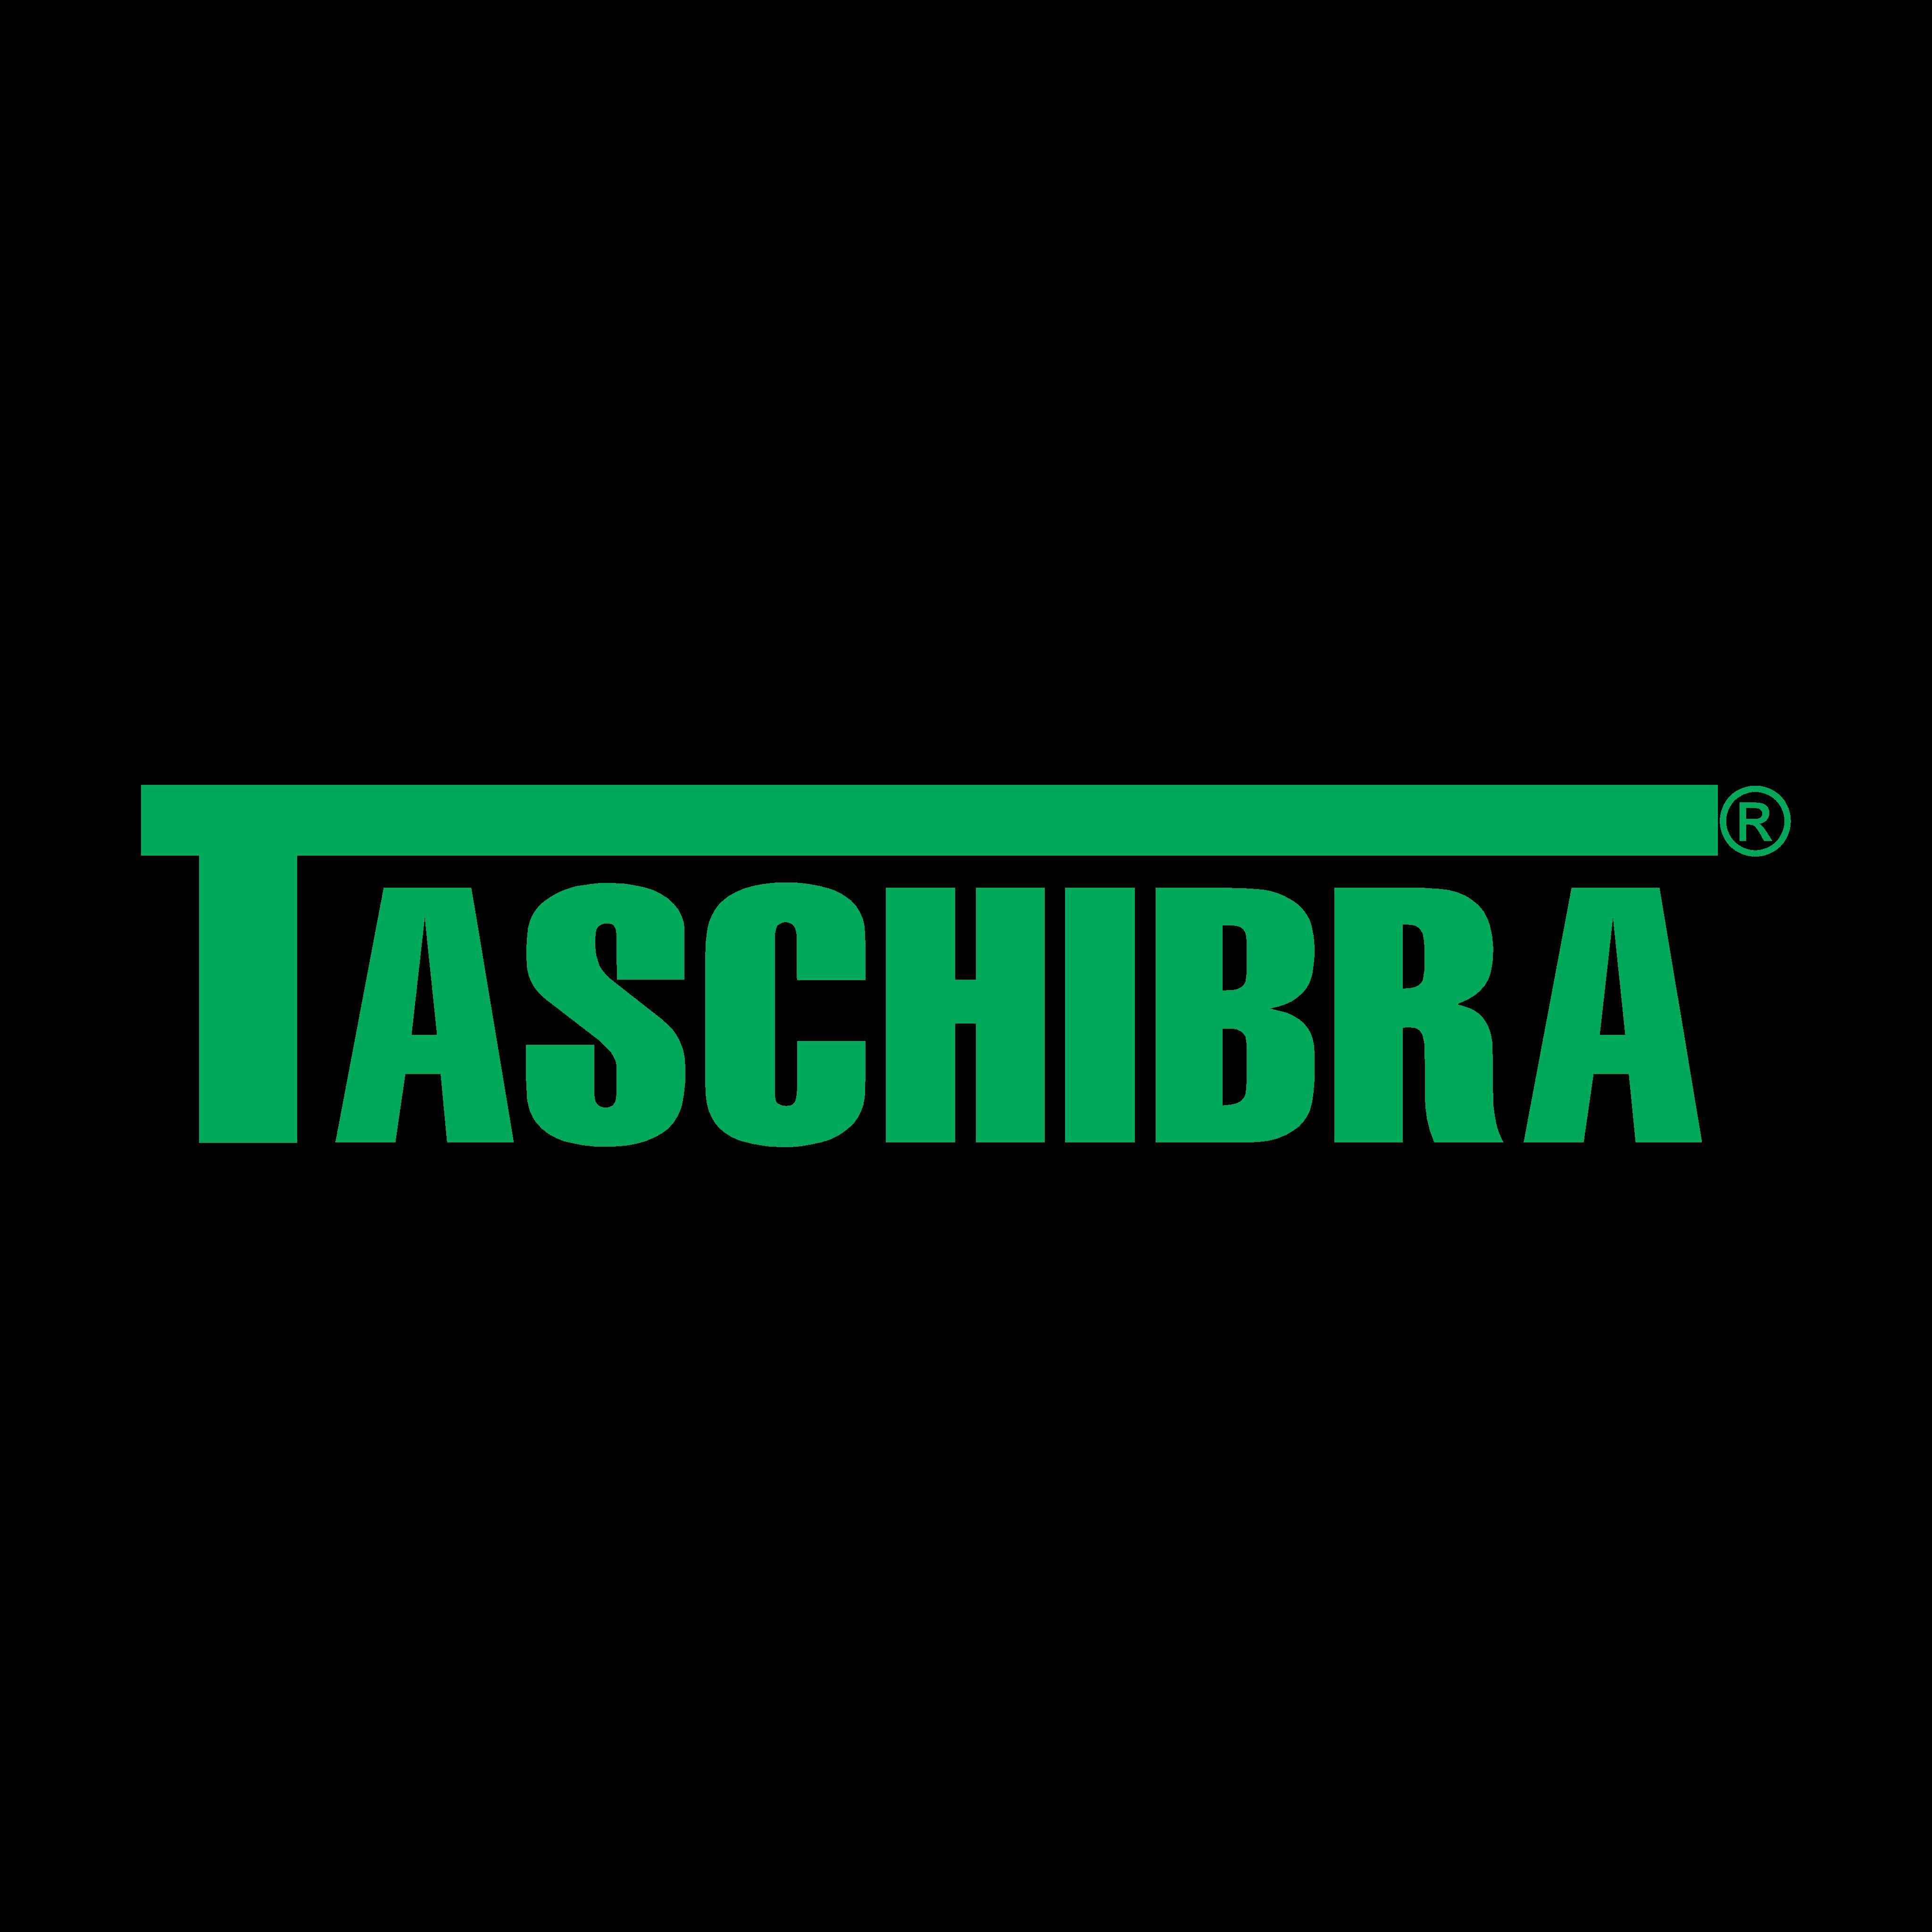 Taschibra Logo PNG.